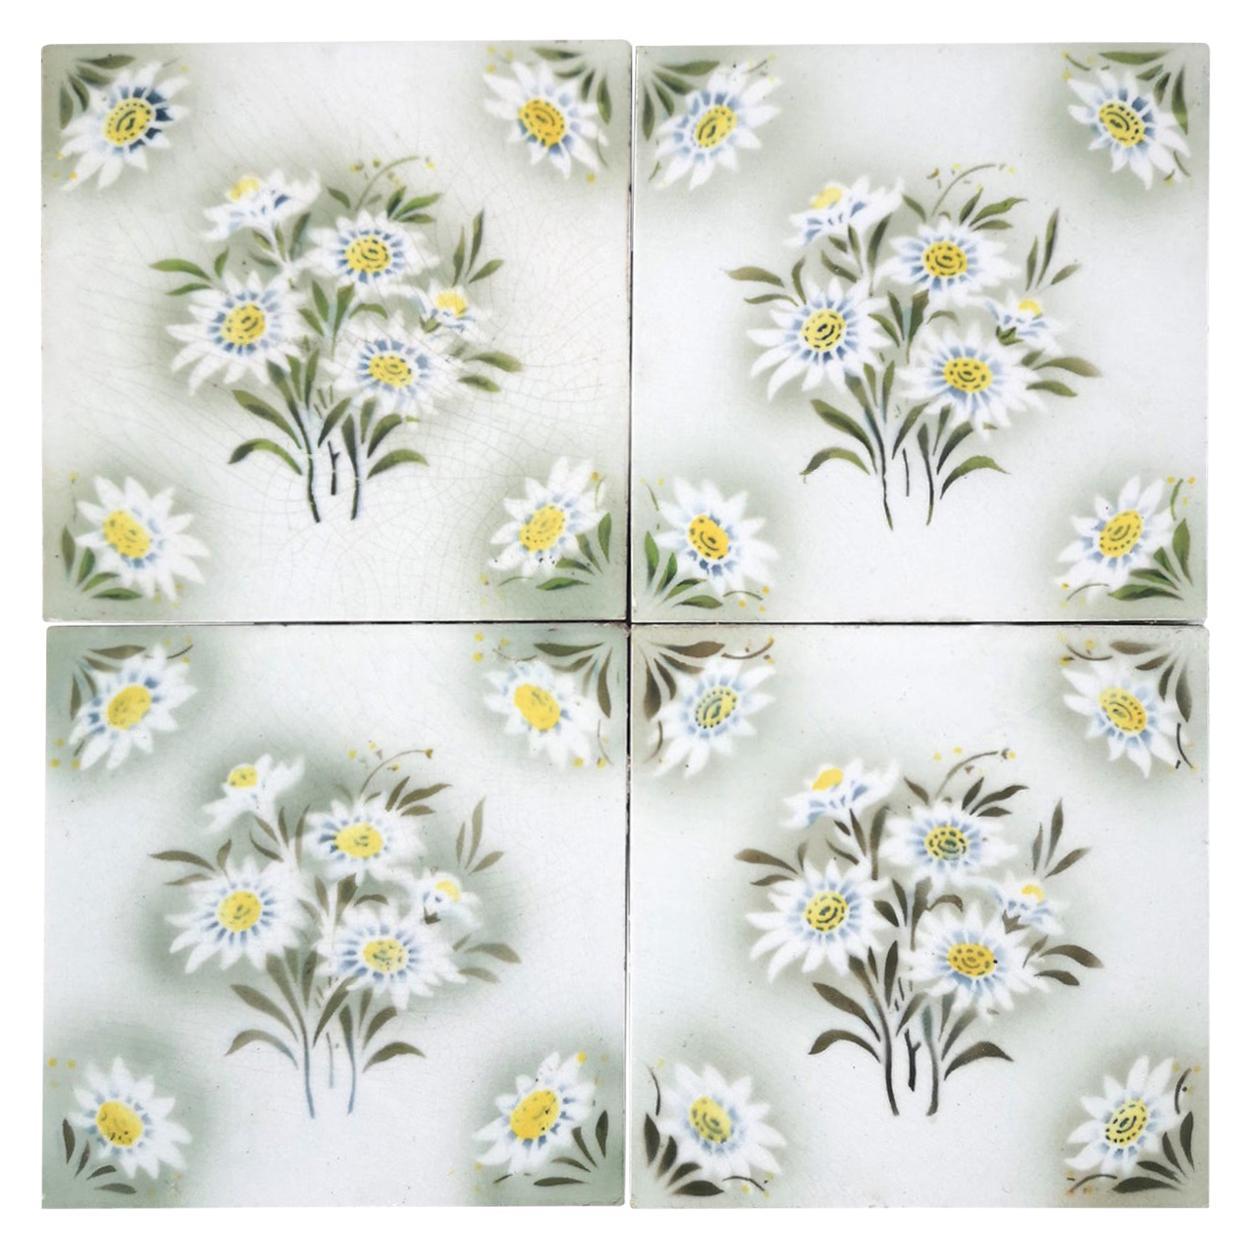 1 of the 100 Antique Ceramic Tiles by Societe Morialme, 1920